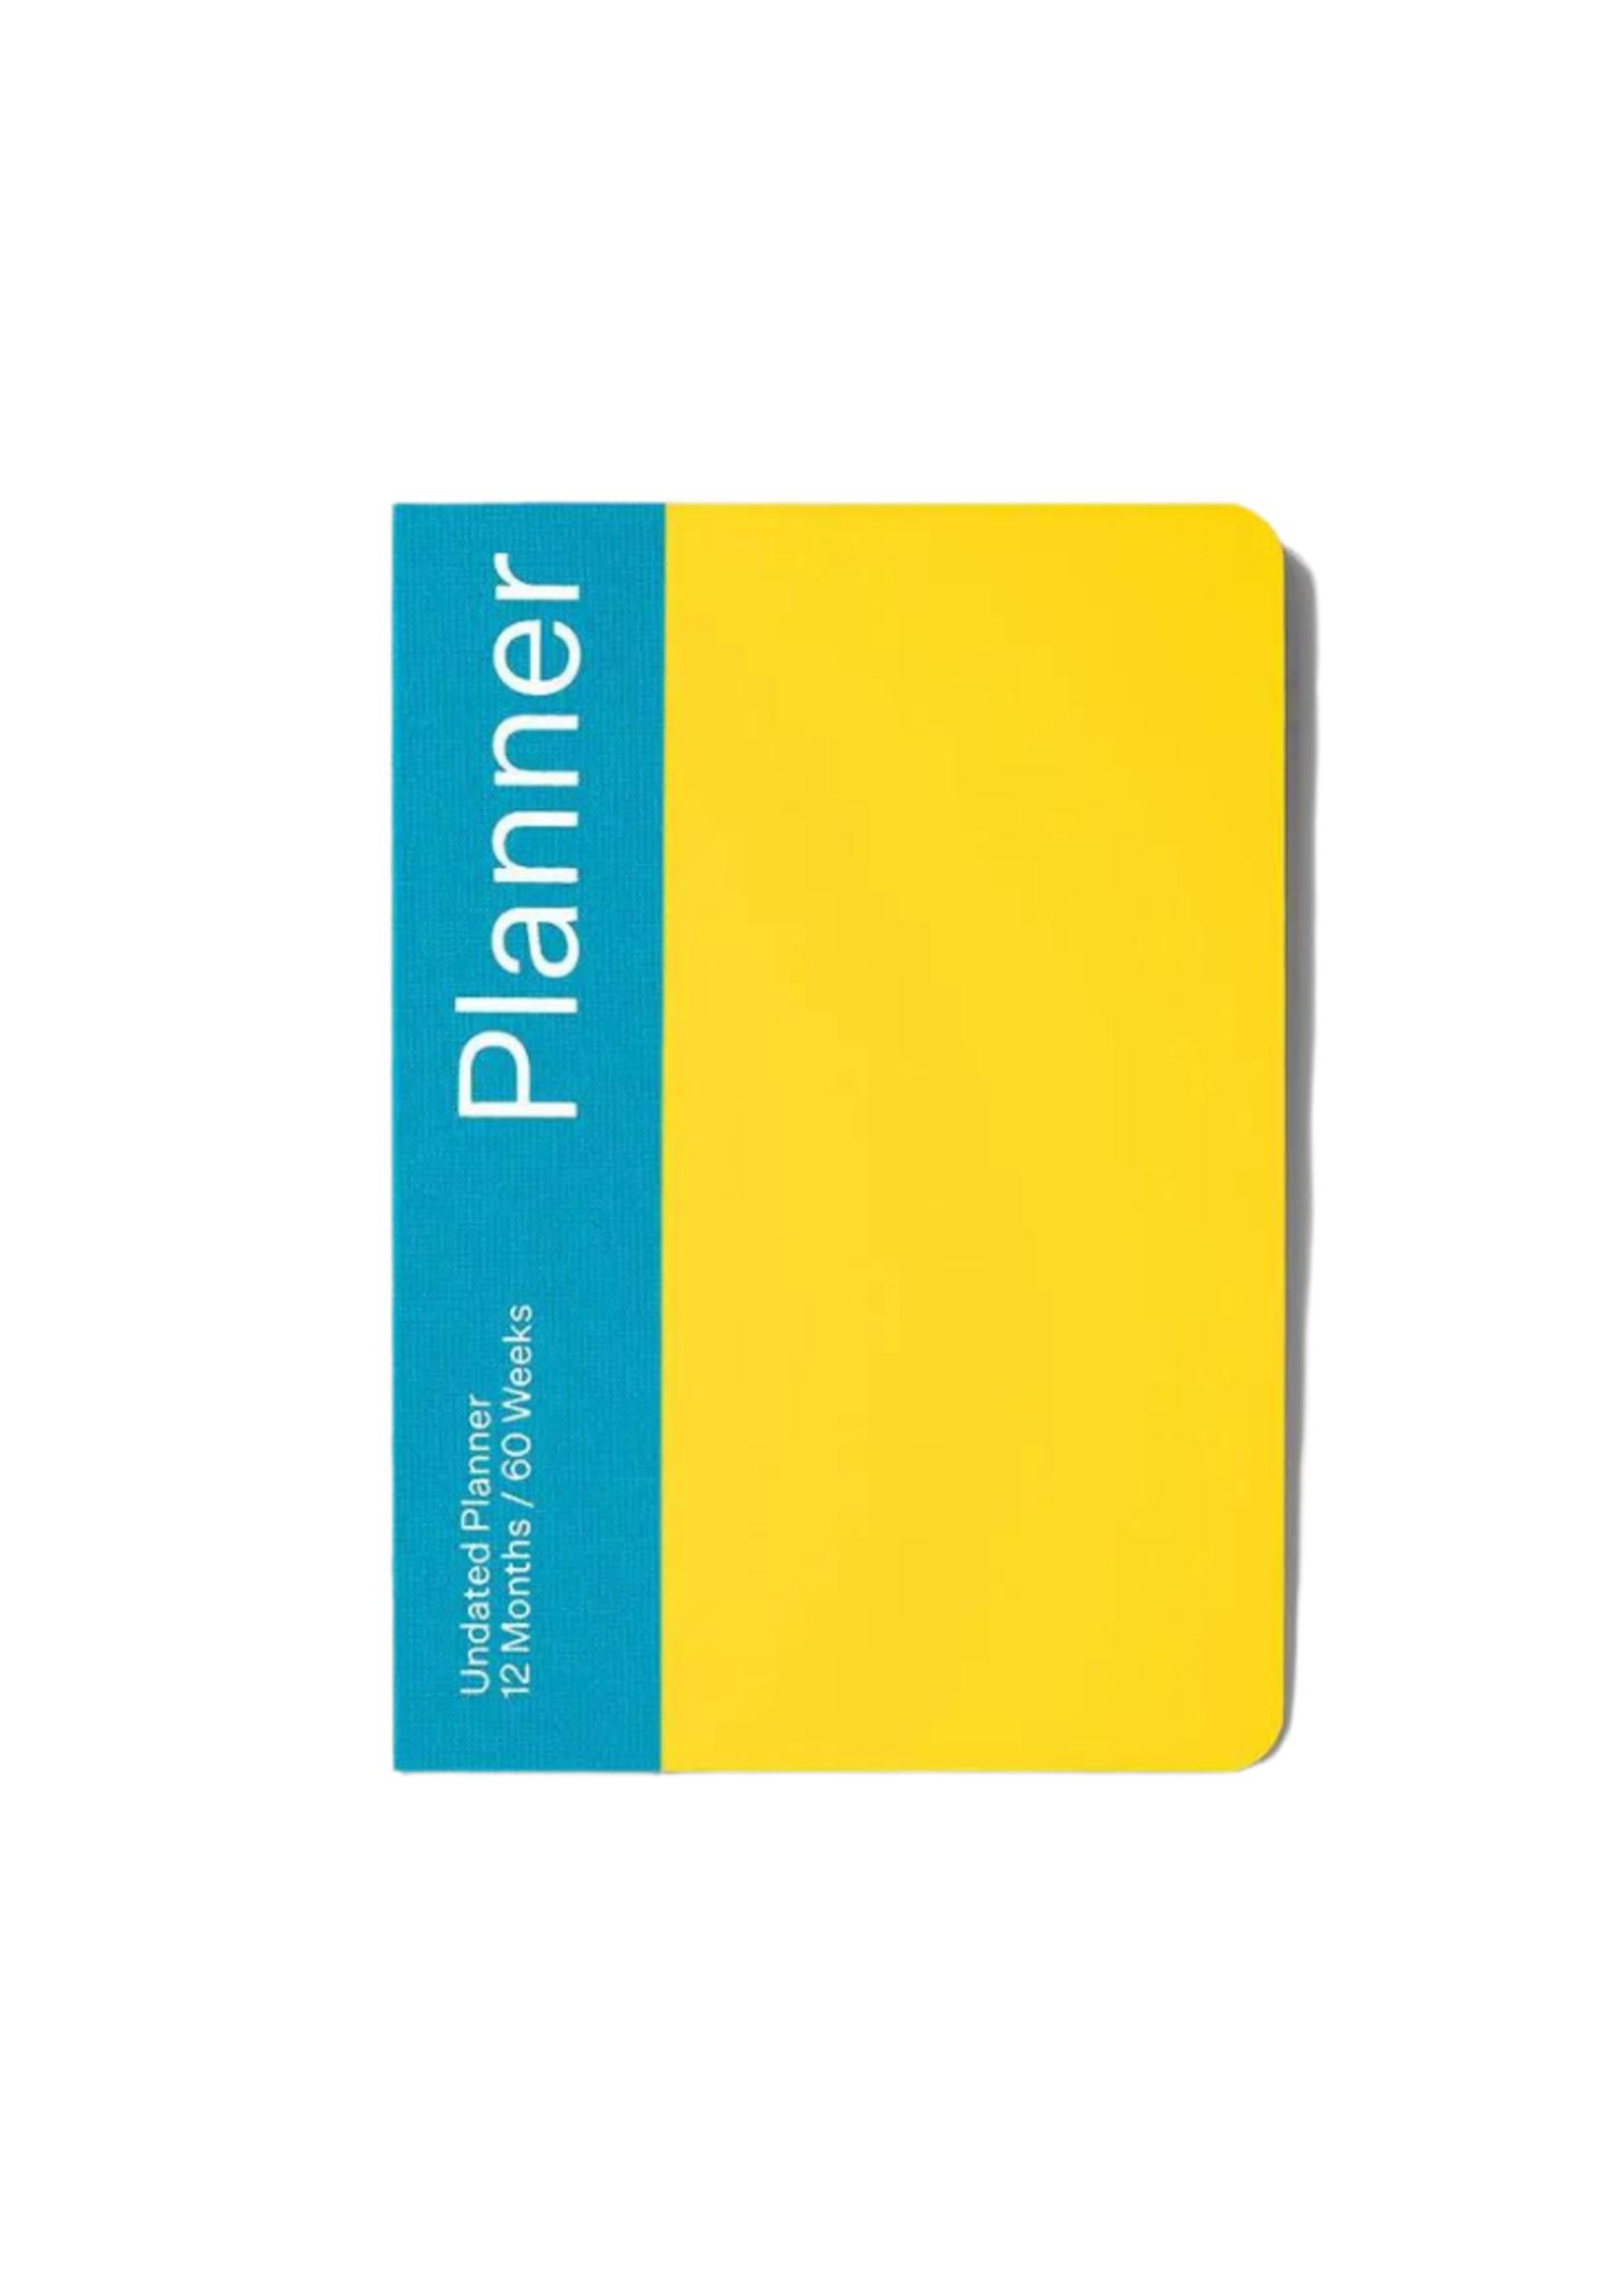 Mishmash Undated Planner Yellow